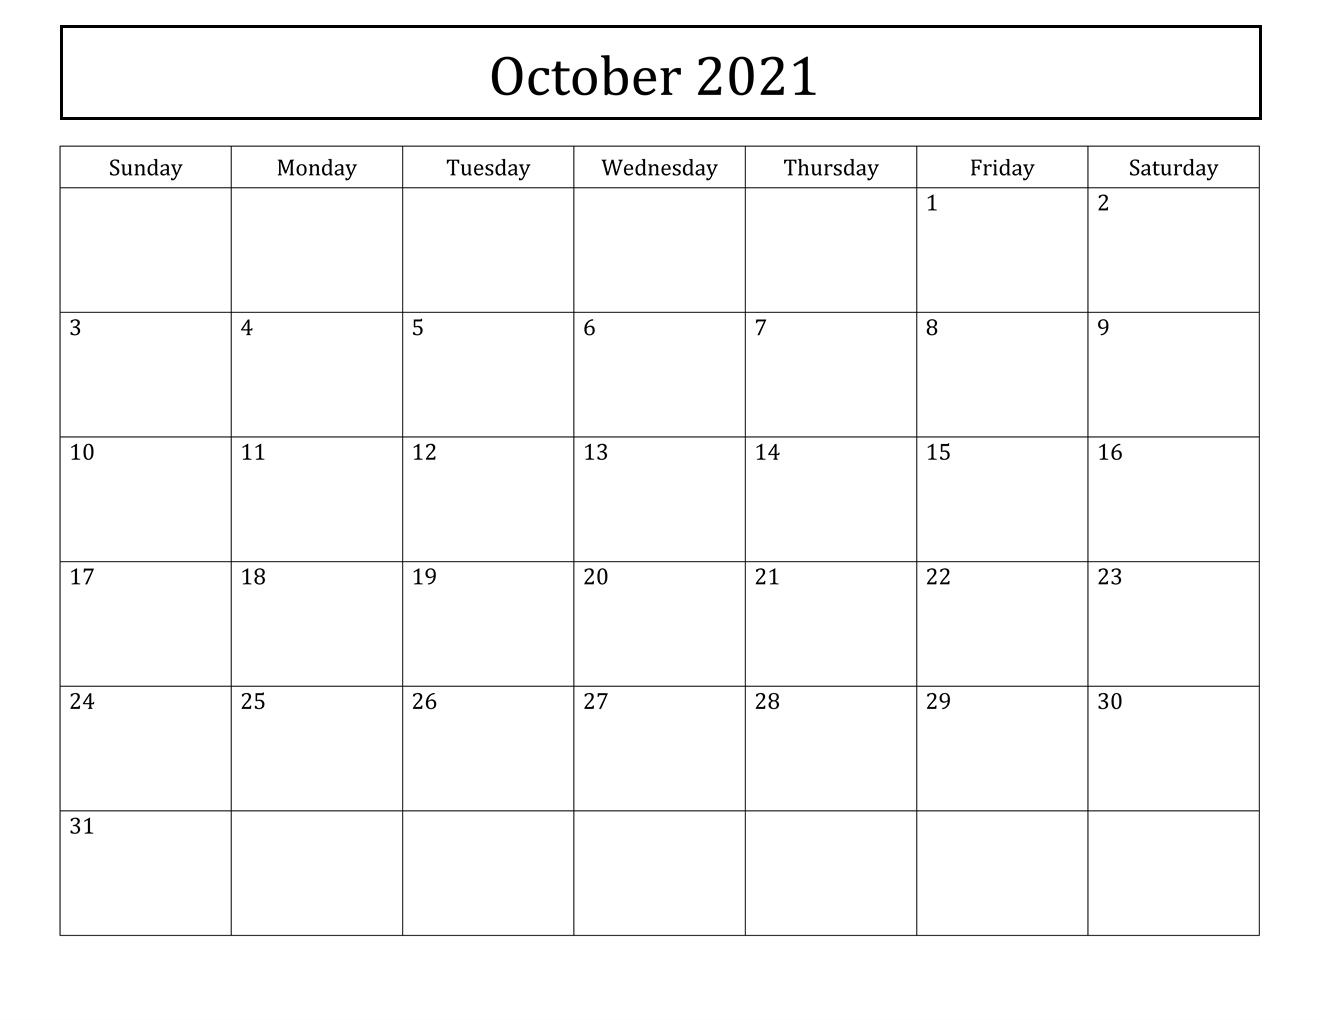 Free October 2021 Calendar Printable - Blank Templates